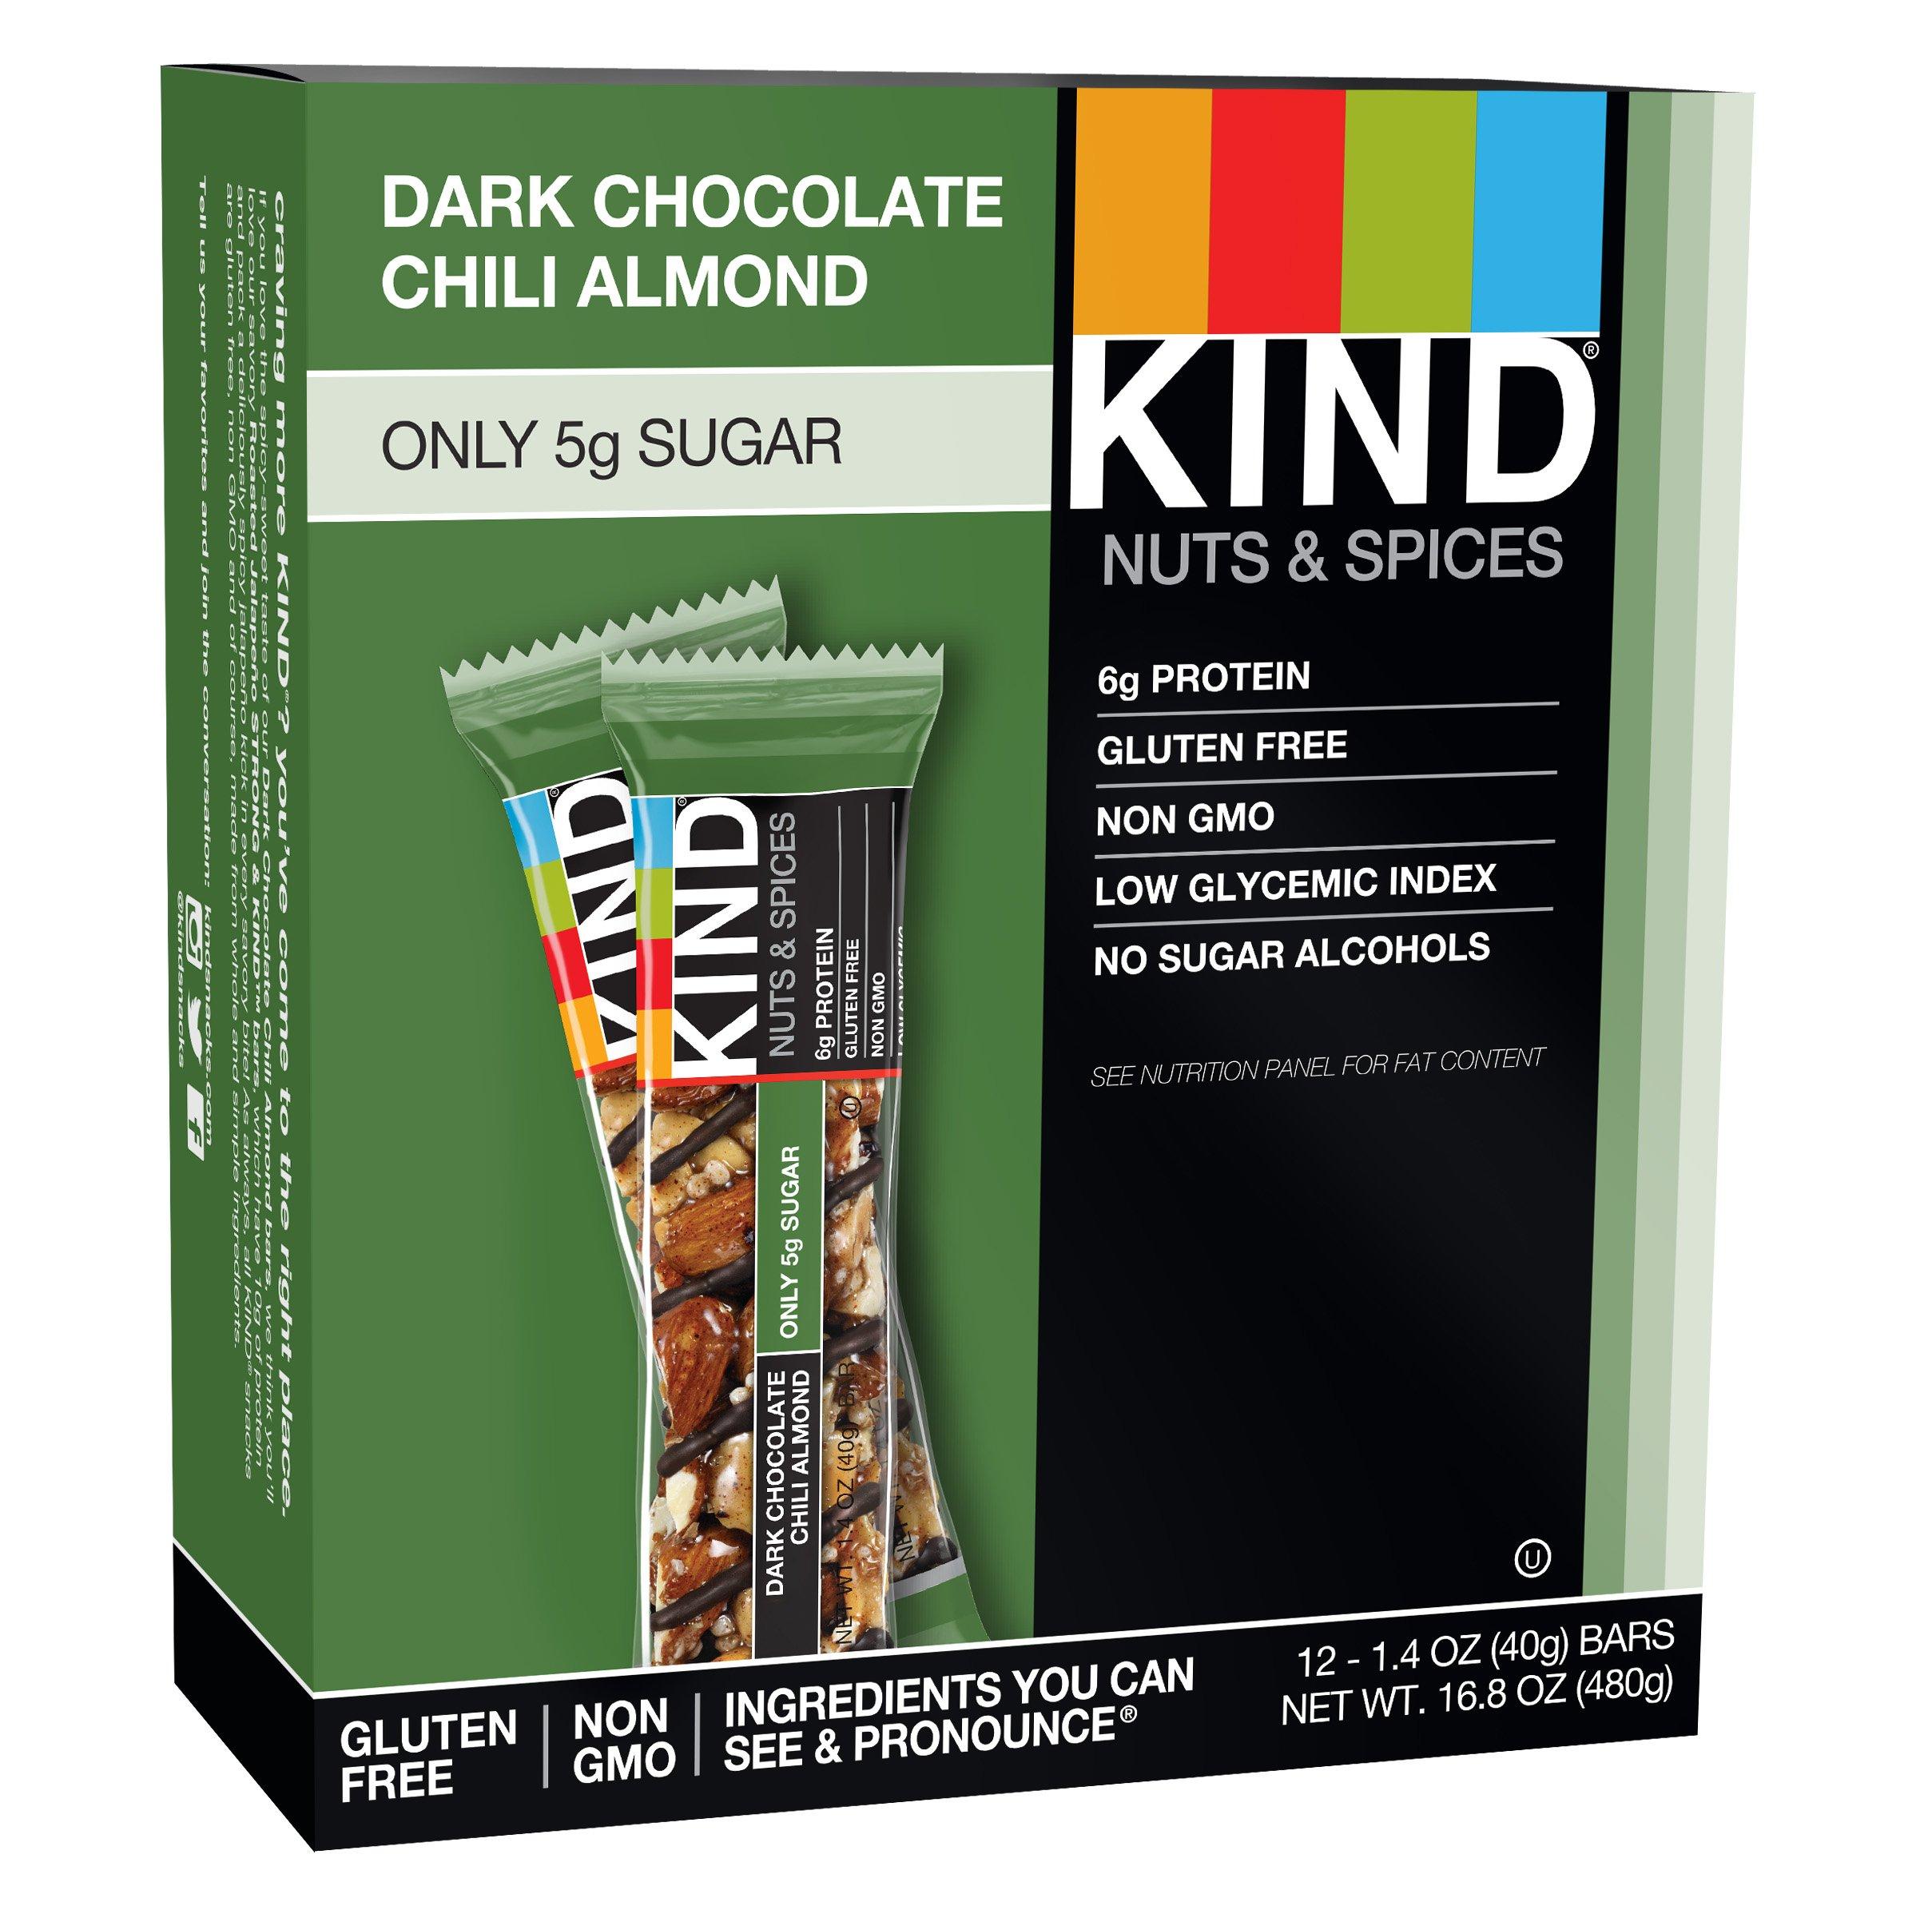 Kind Bars Dark Chocolate Chili Almond Gluten Free 1.4 Ounce Bars 12 Count 18